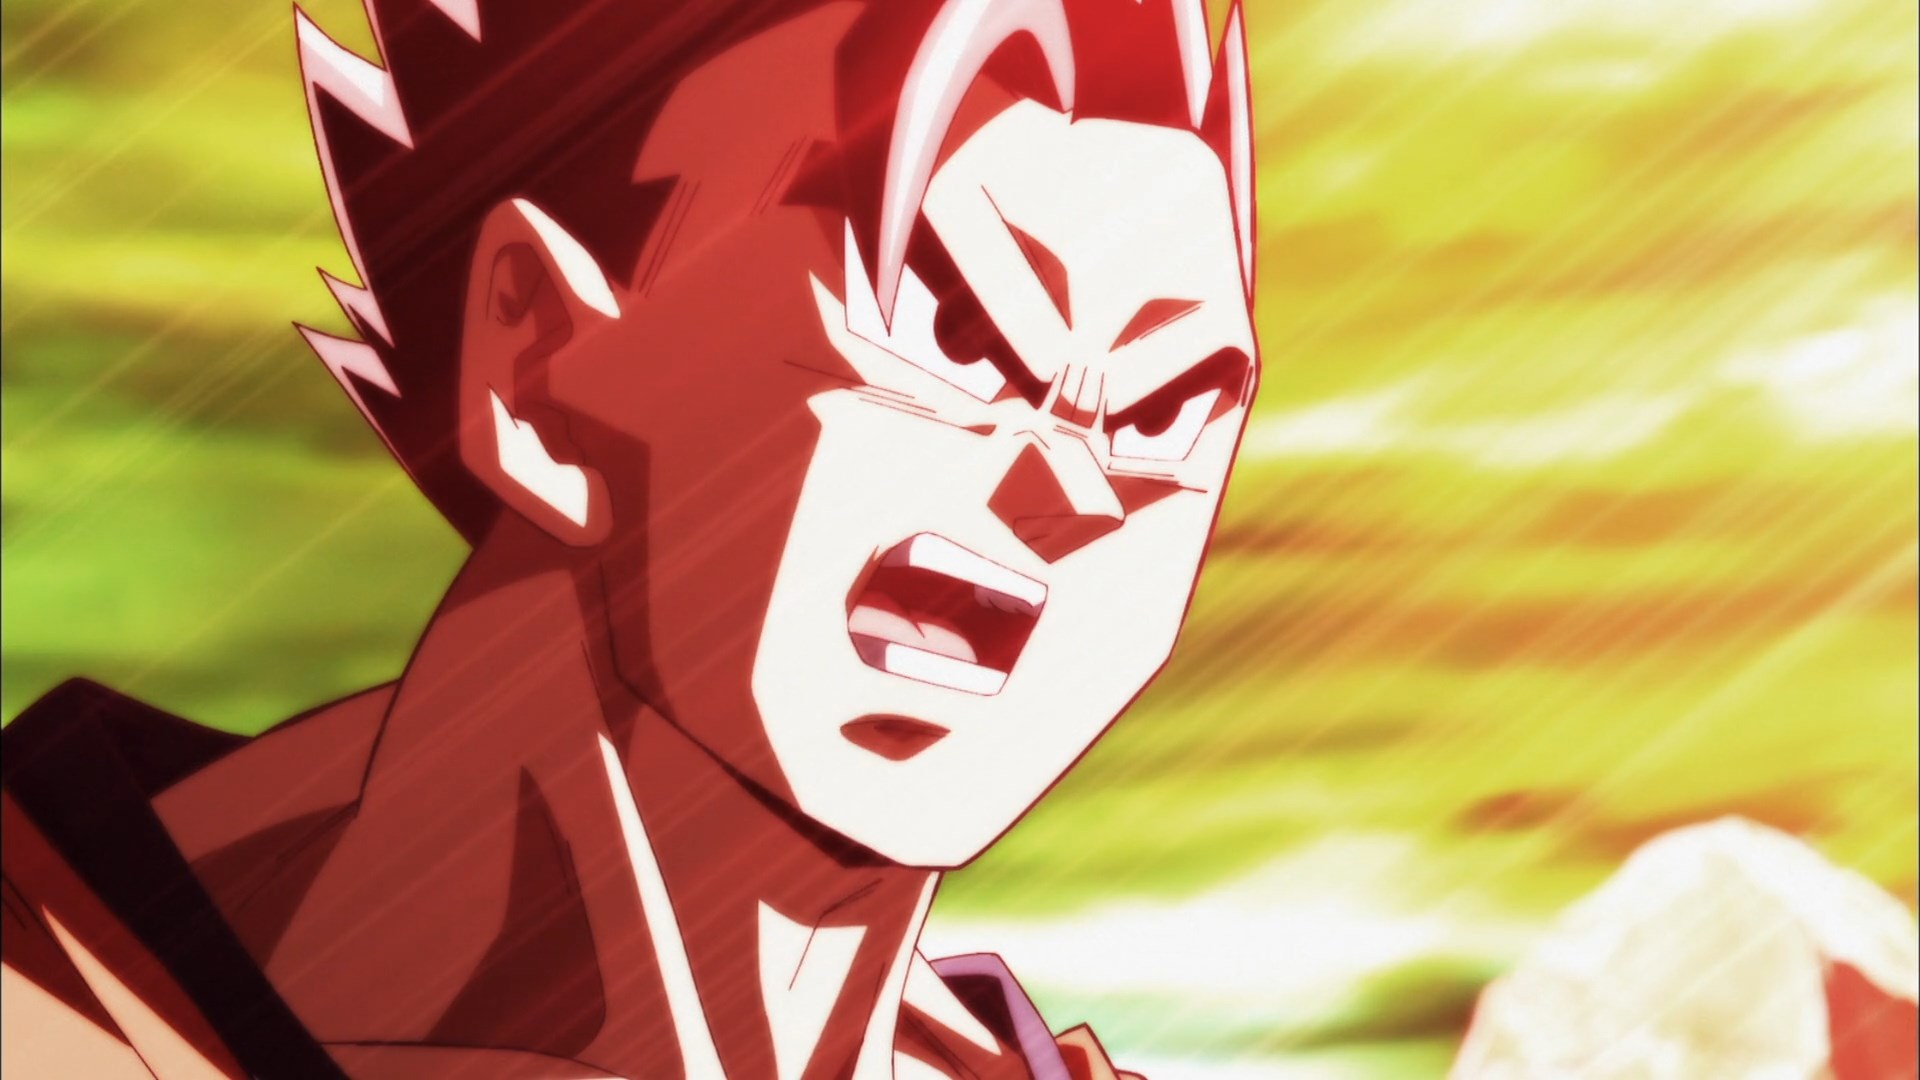 [HorribleSubs] Dragon Ball Super - 121 [1080p].mkv_snapshot_16.46